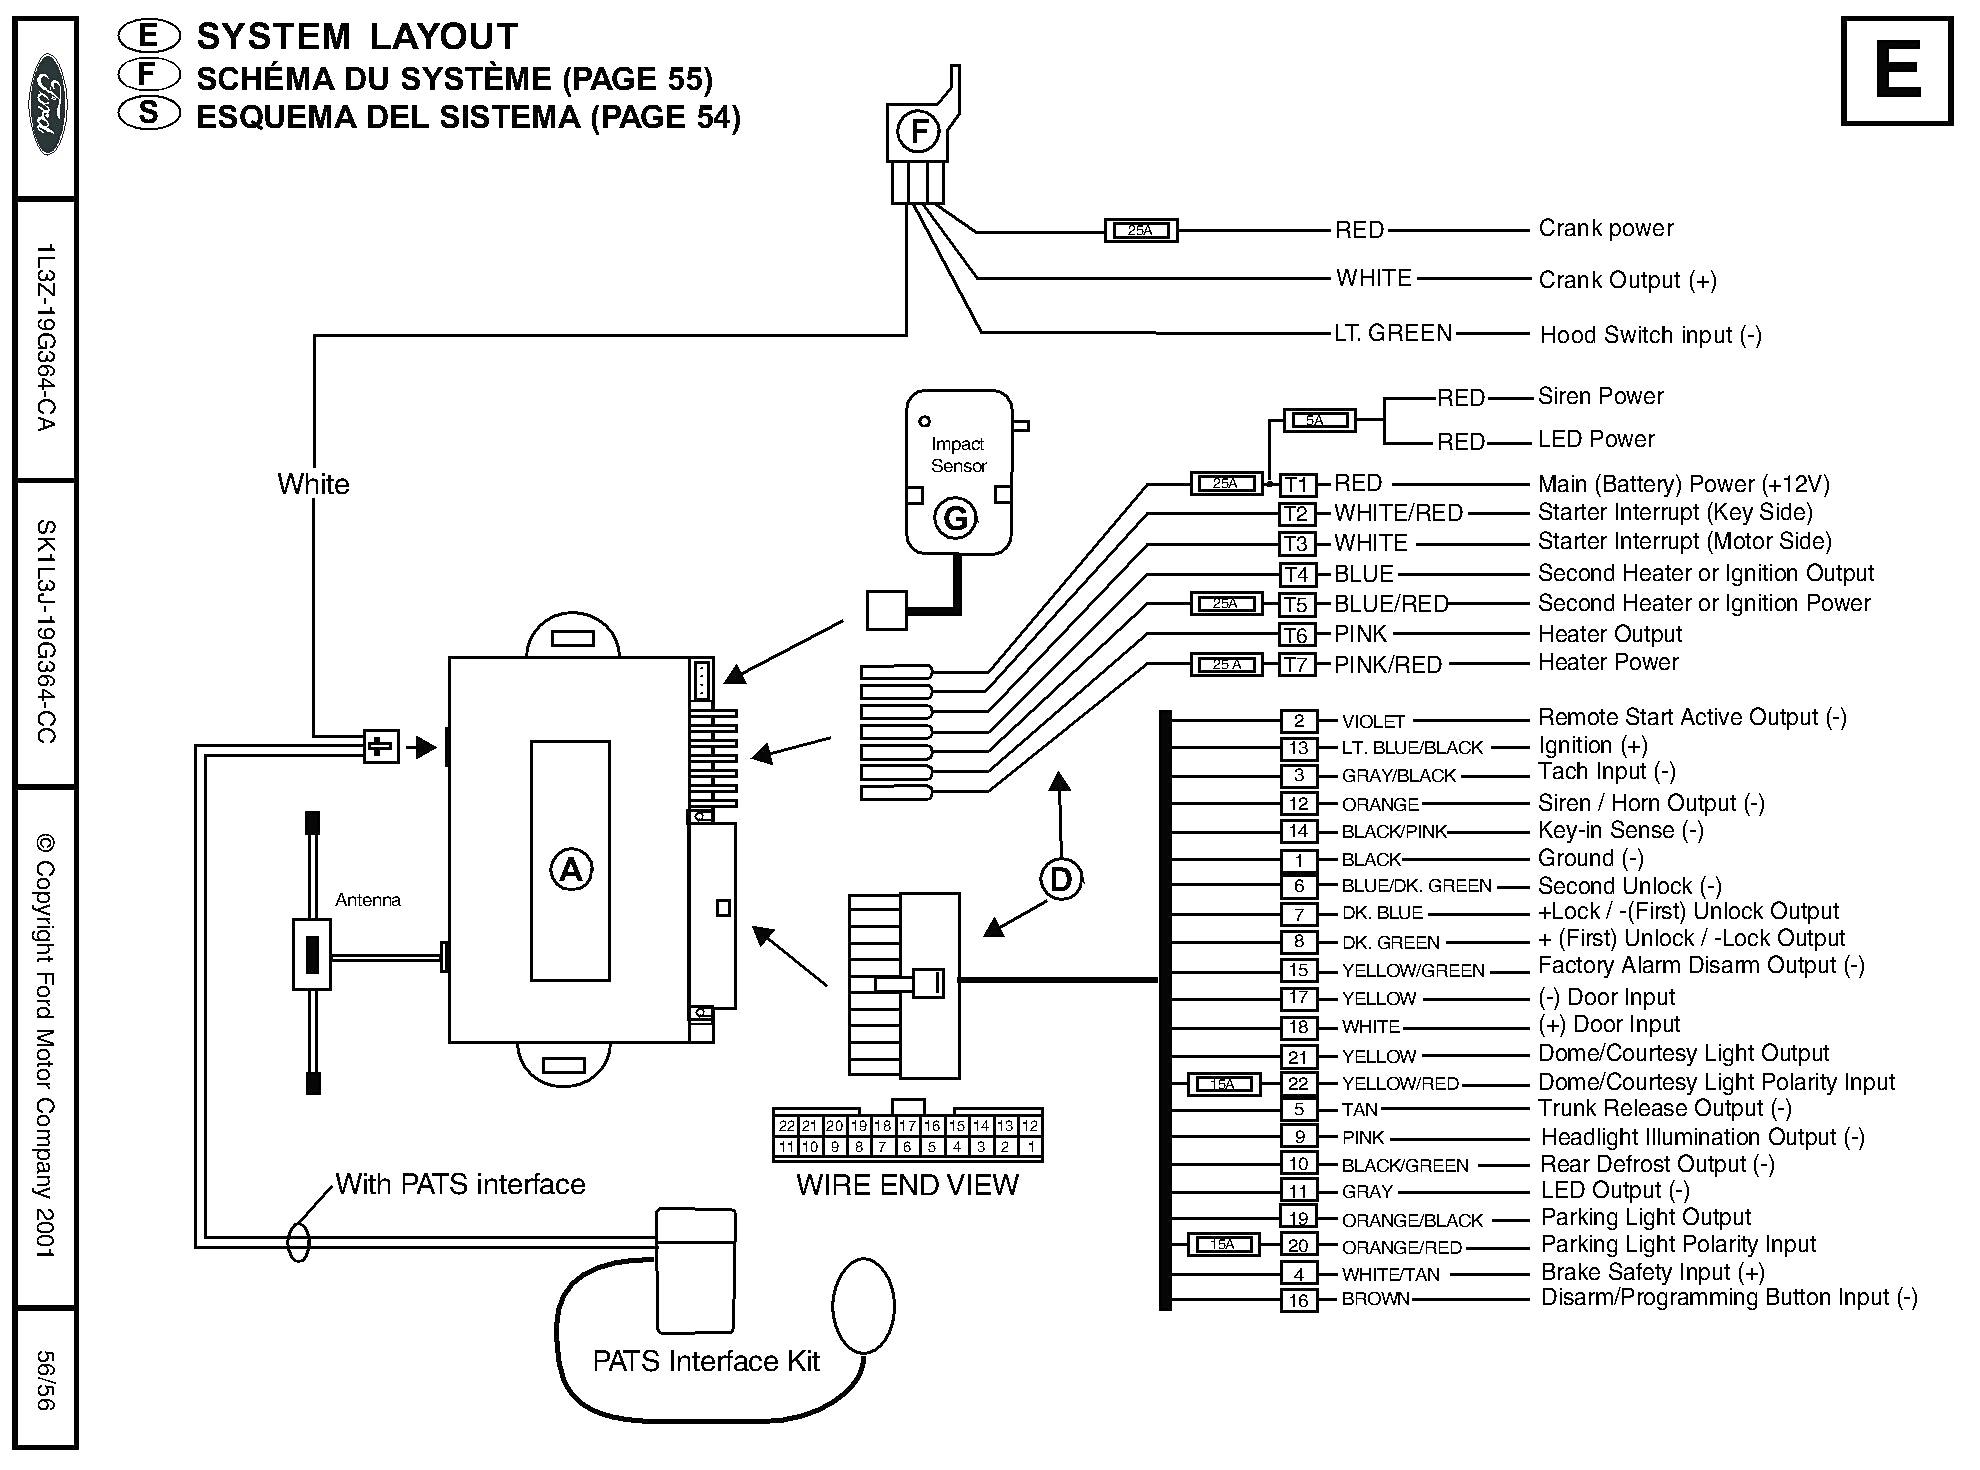 Bulldog Security Remote Starter Wiring Diagram 1999 Chevy Silverado - Bulldog Security Wiring Diagram